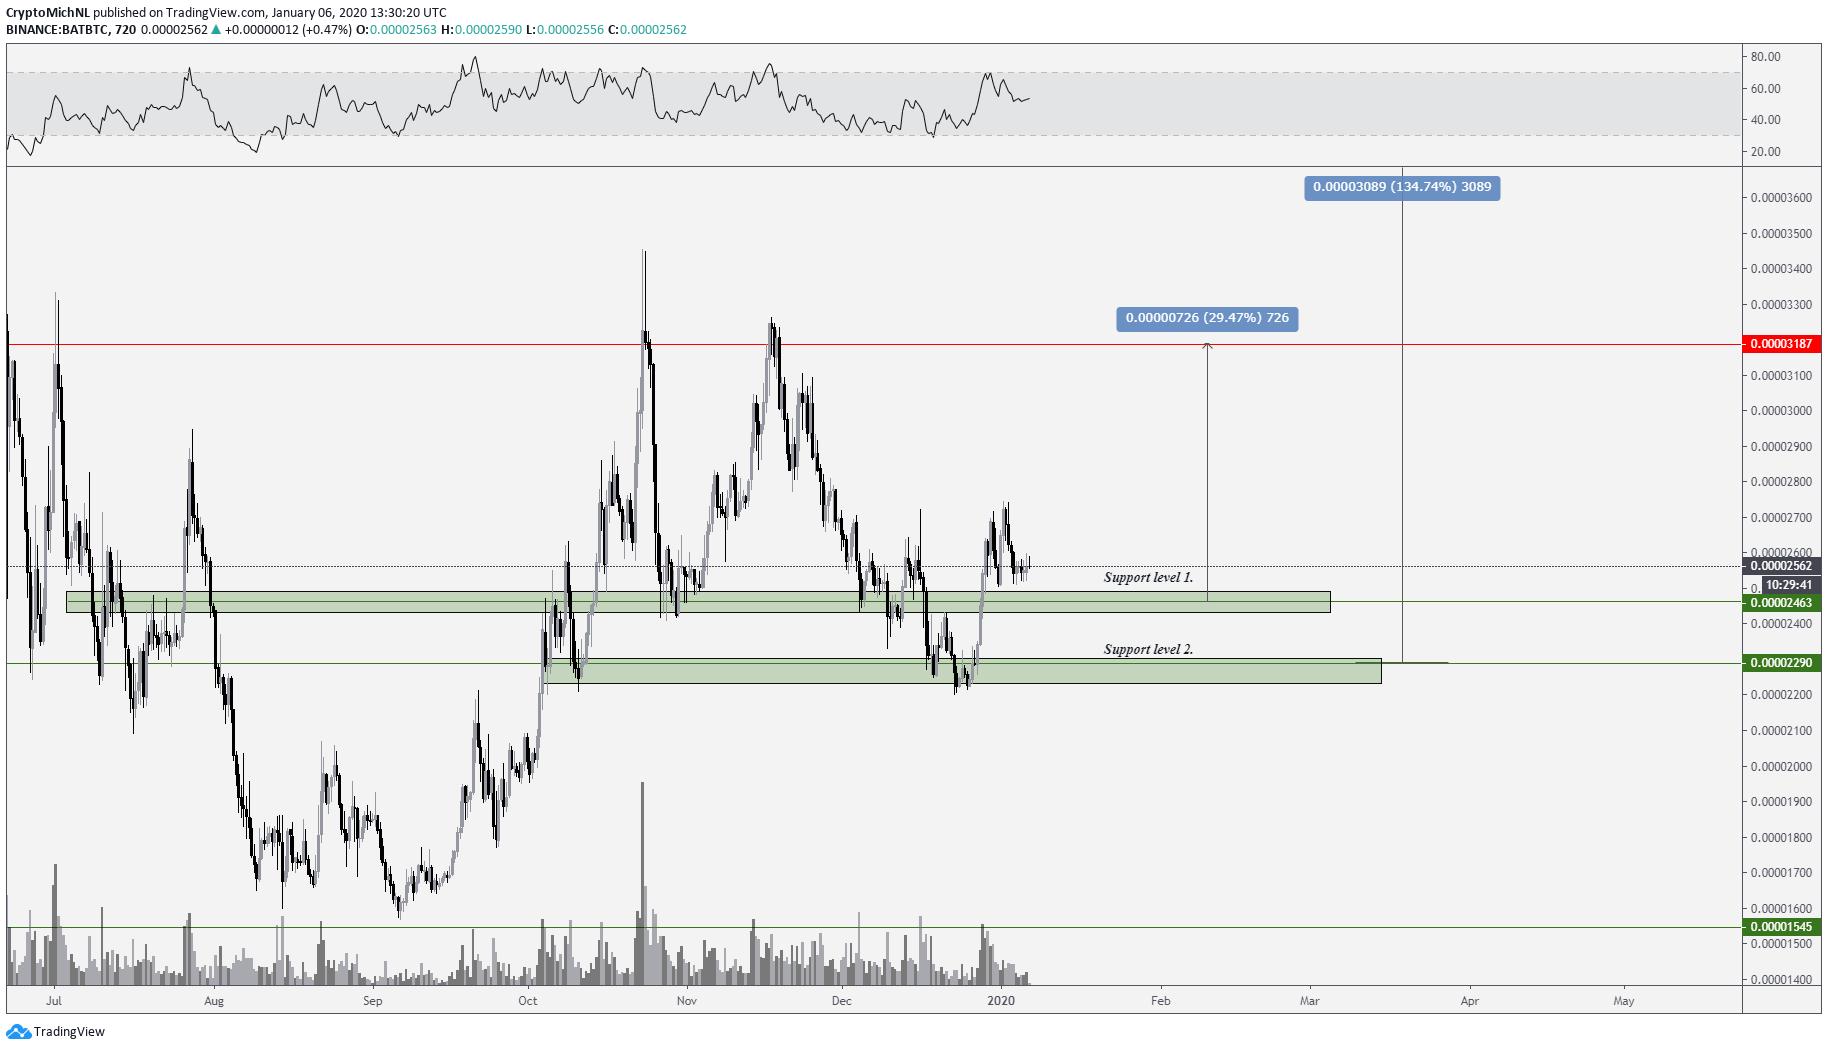 bat cryptocurrency price prediction